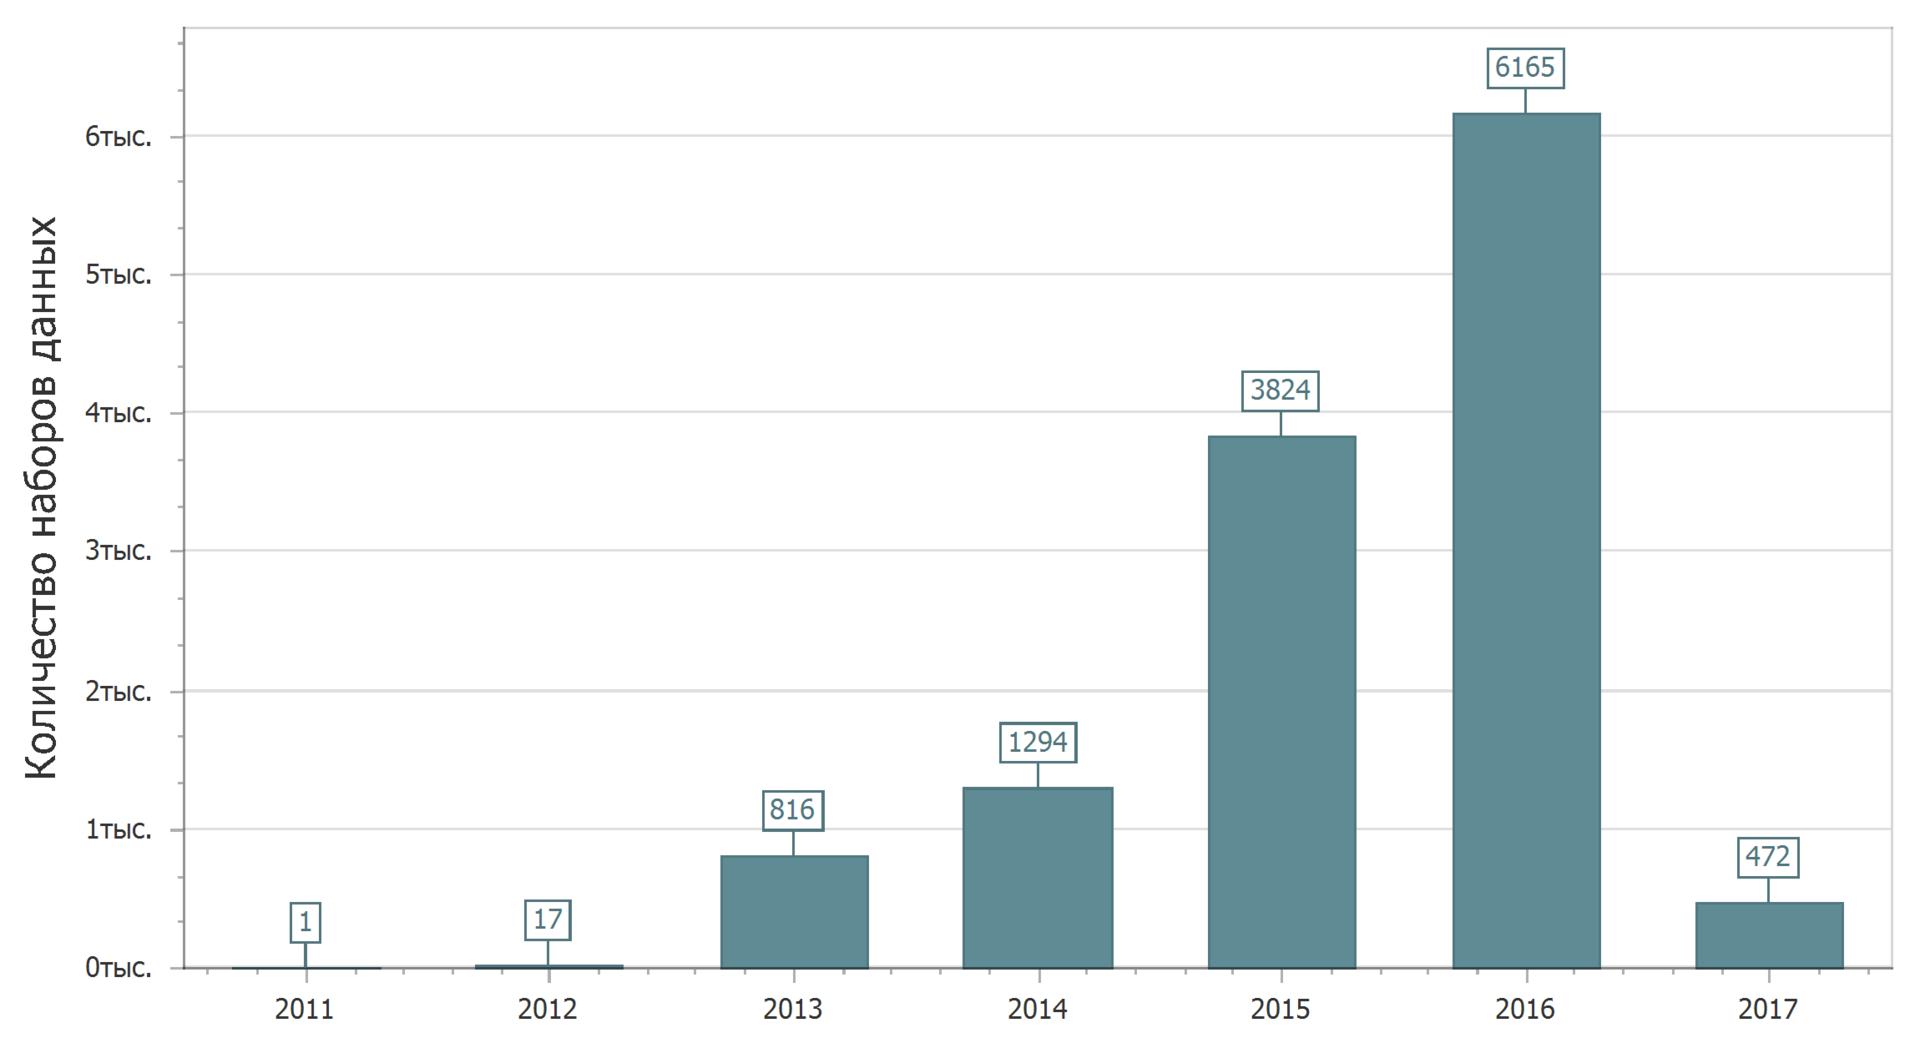 Анализ наборов данных с портала открытых данных data.gov.ru - 5